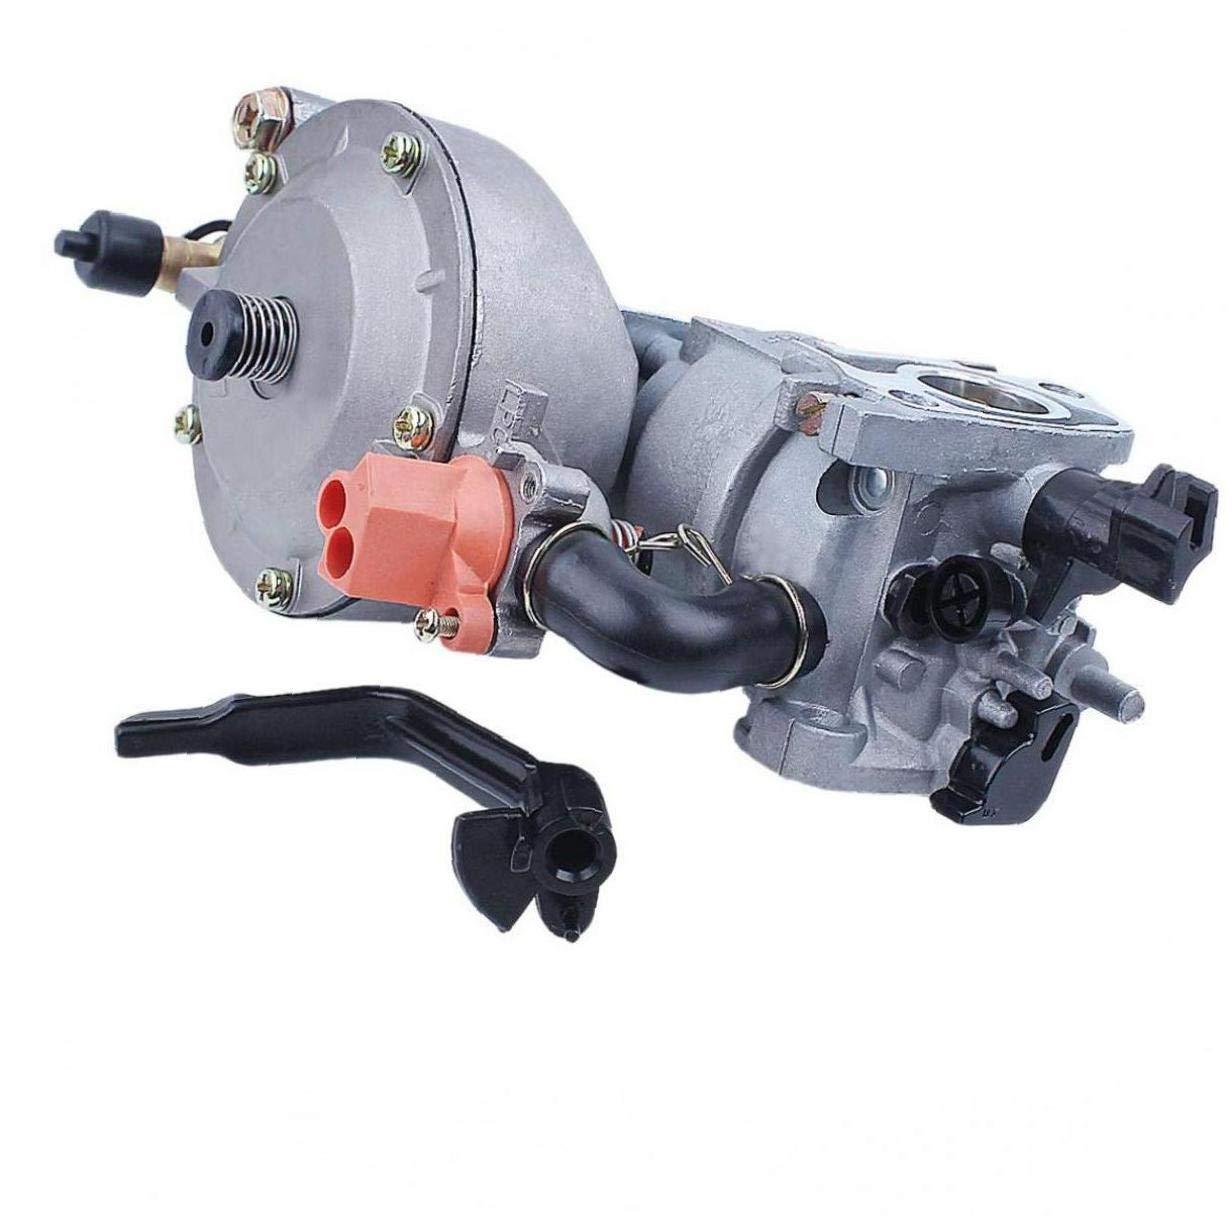 Hiinice Kit di filtri Dual Fuel carburatore per Honda GX160 5.5HP GX200 Engine Motore CNG GPL Parti di Ricambio e Accessori